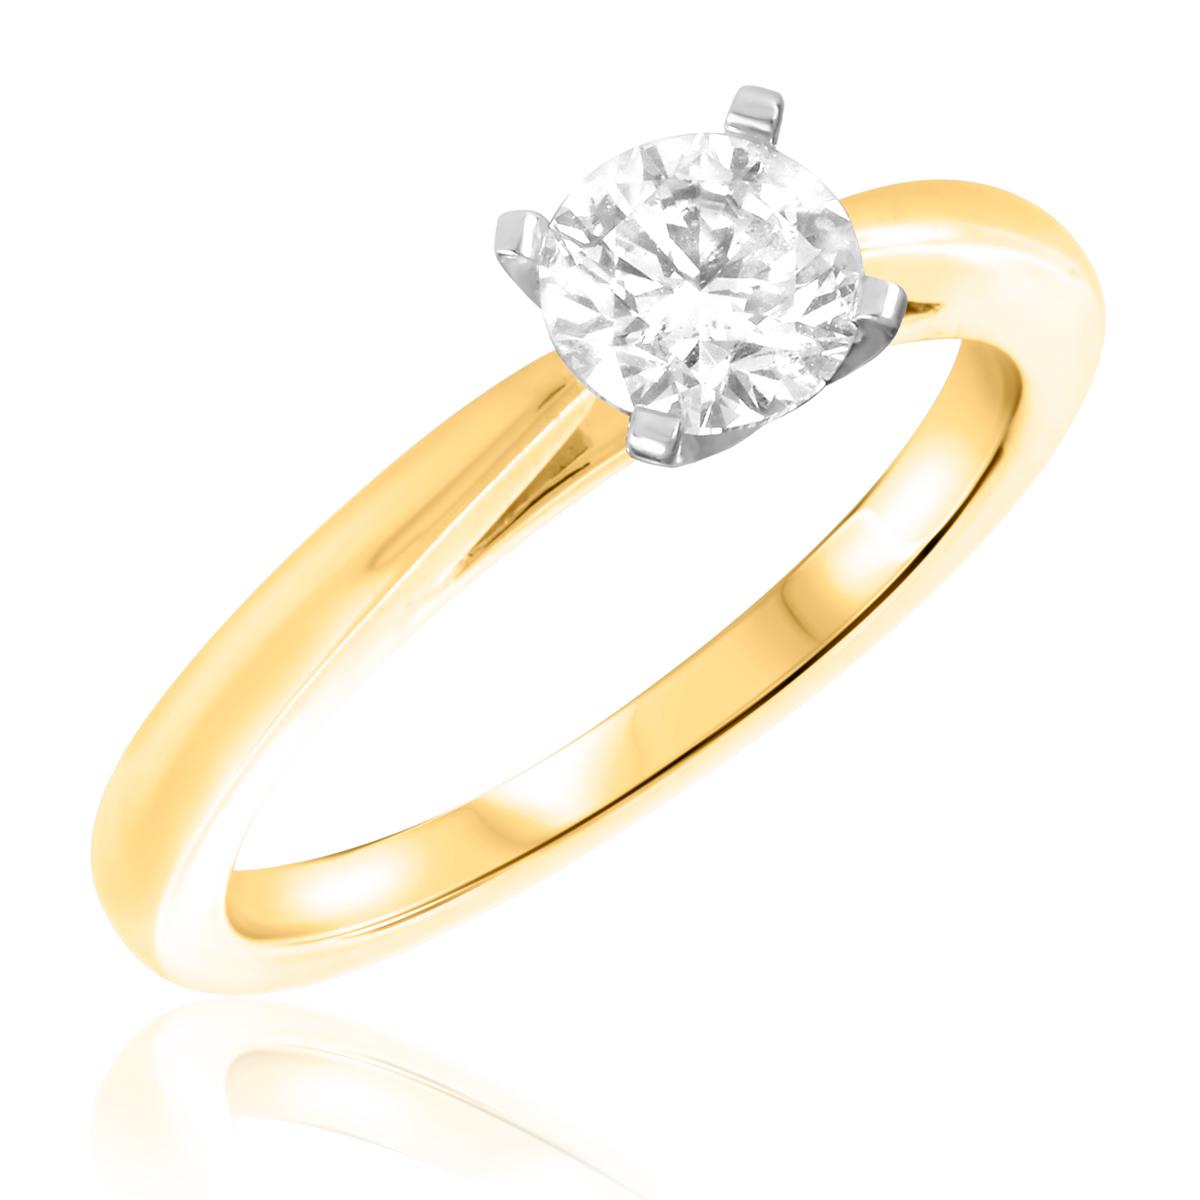 1 CT. T.W. Diamond Ladies Engagement Ring 14K Yellow Gold- Size 8